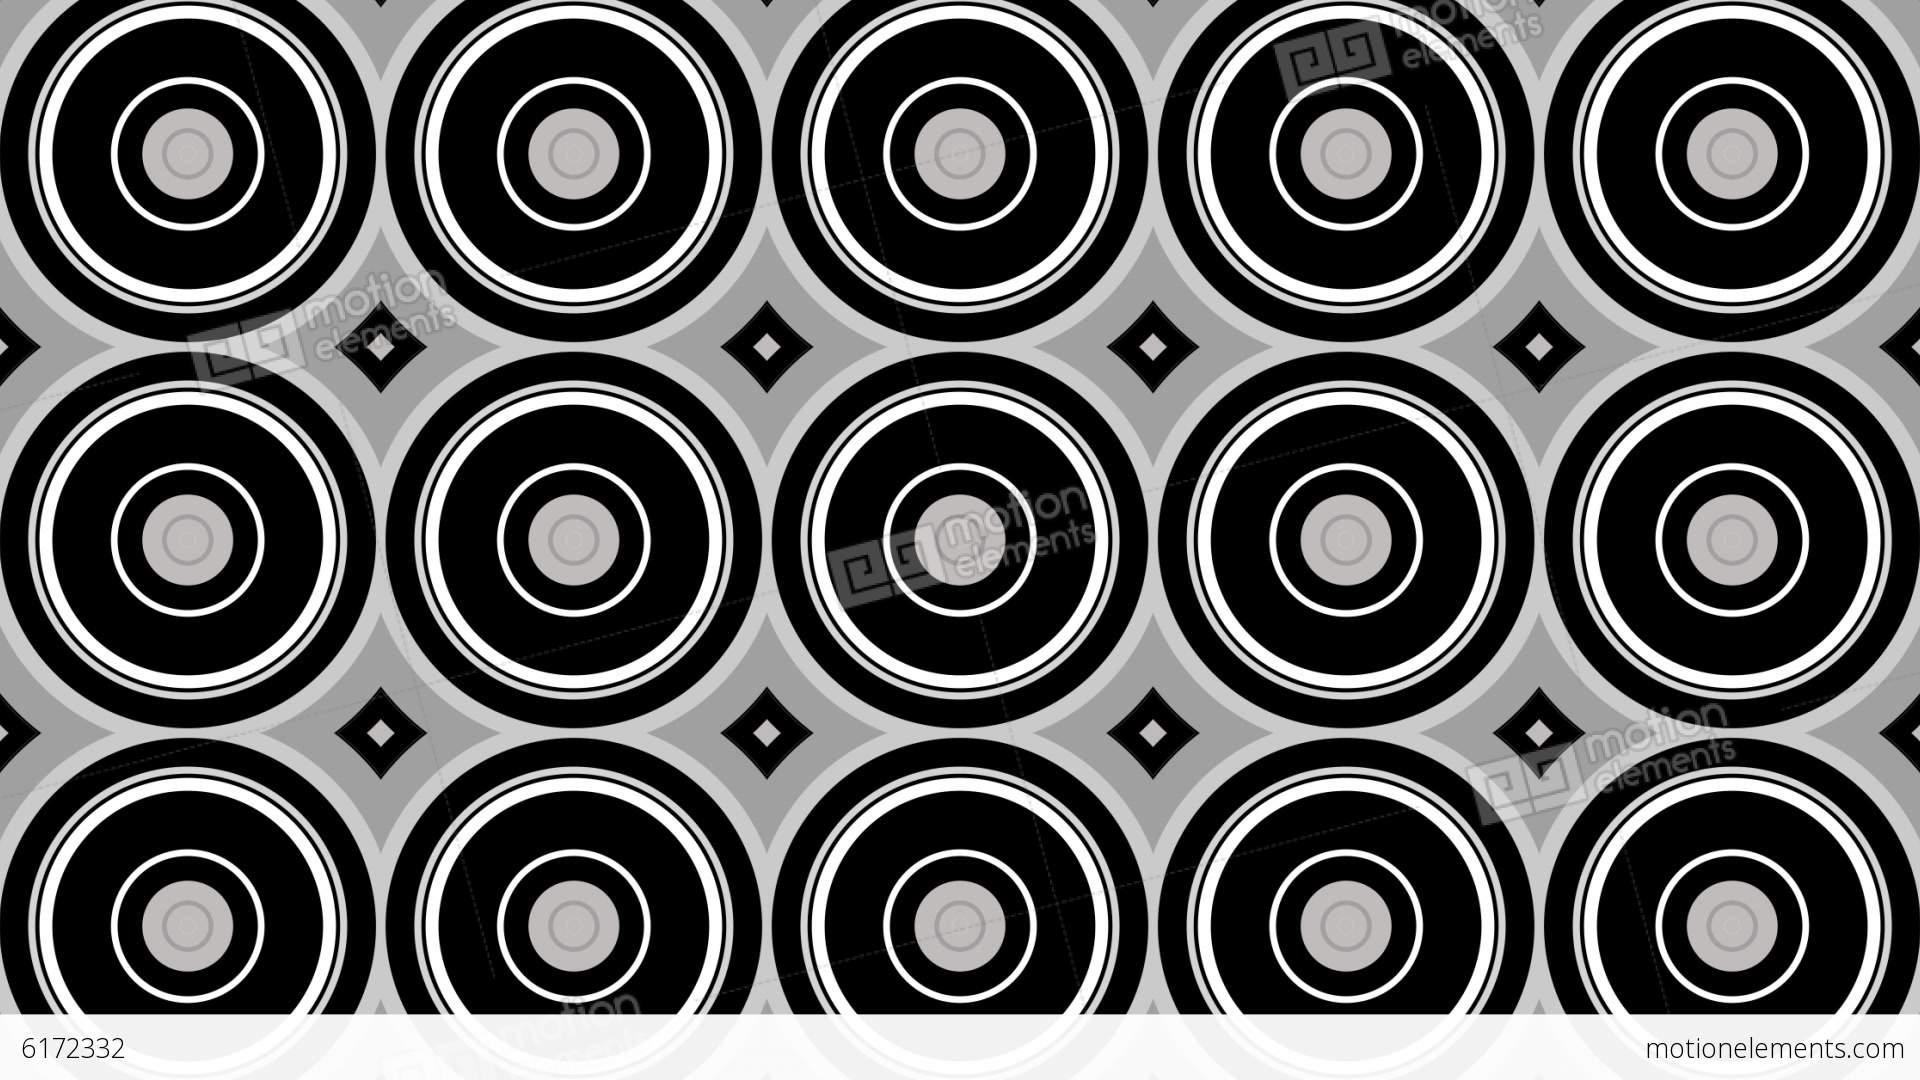 Circle Tiles Waving Circle Tiles Stock Animation 6172332